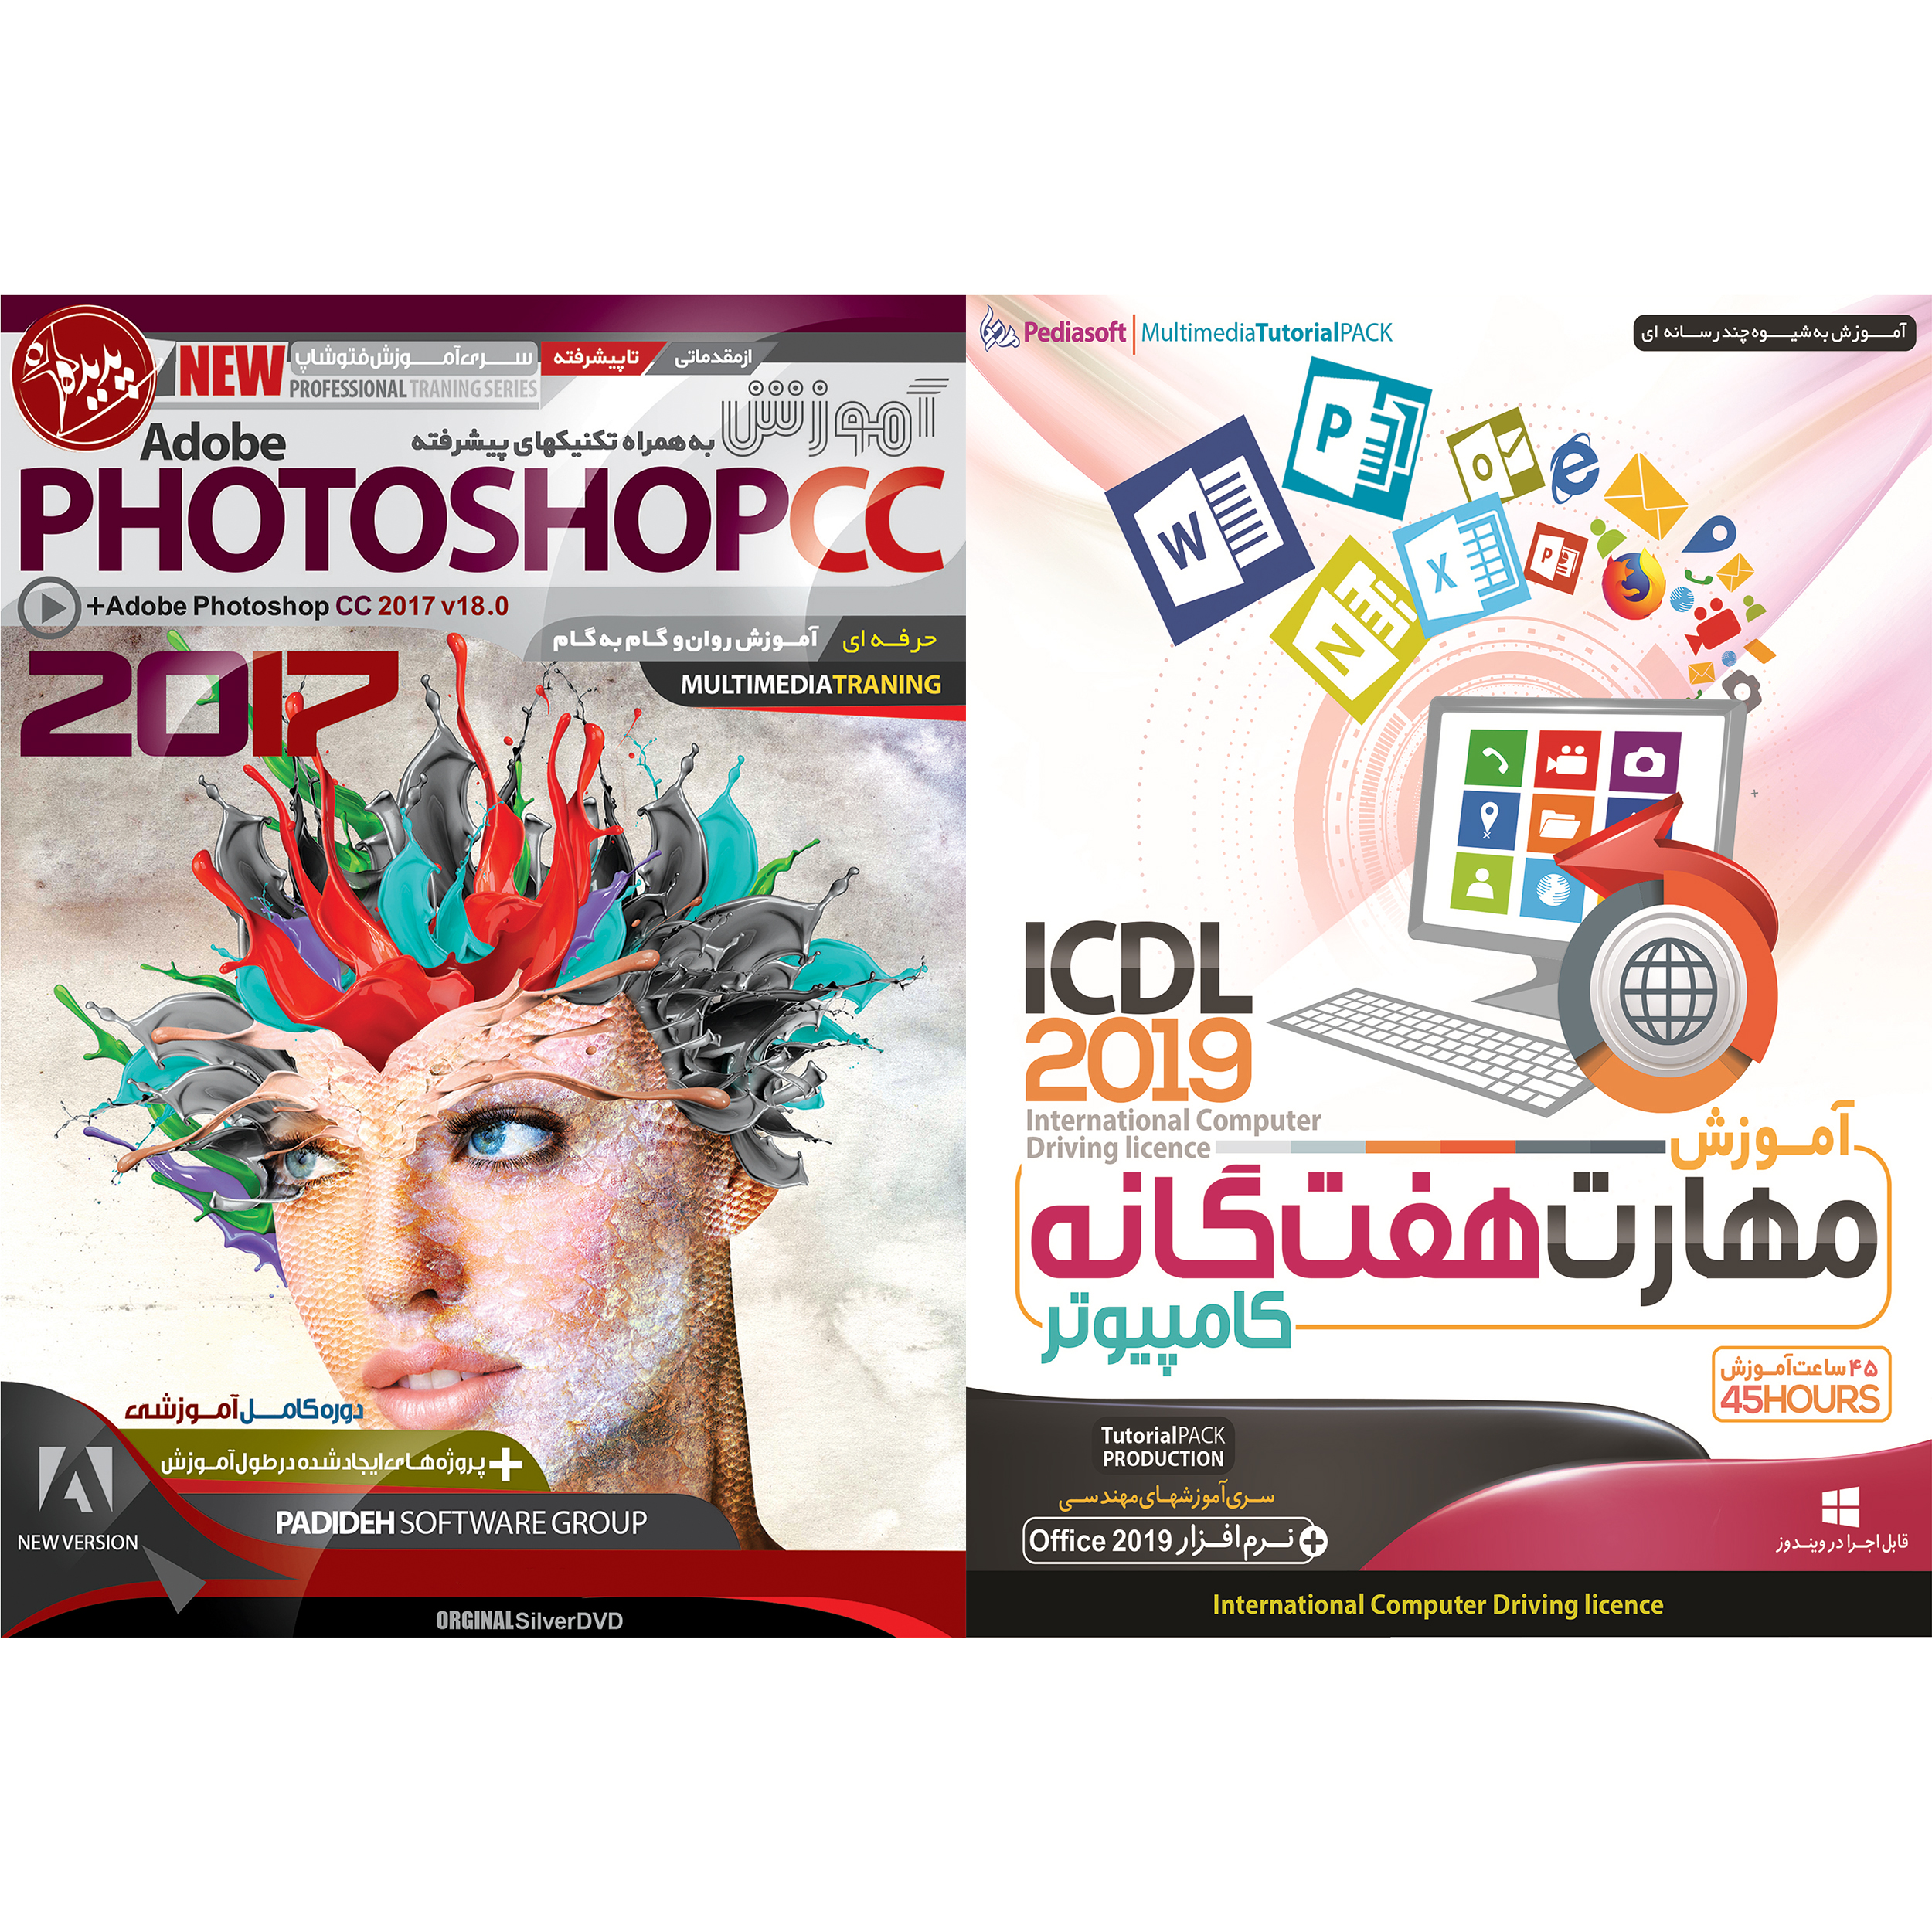 نرم افزار آموزش مهارت هفتگانه کامپیوتر ICDL 2019 نشر پدیا به همراه نرم افزار آموزش PhotoShop نشر پدیده